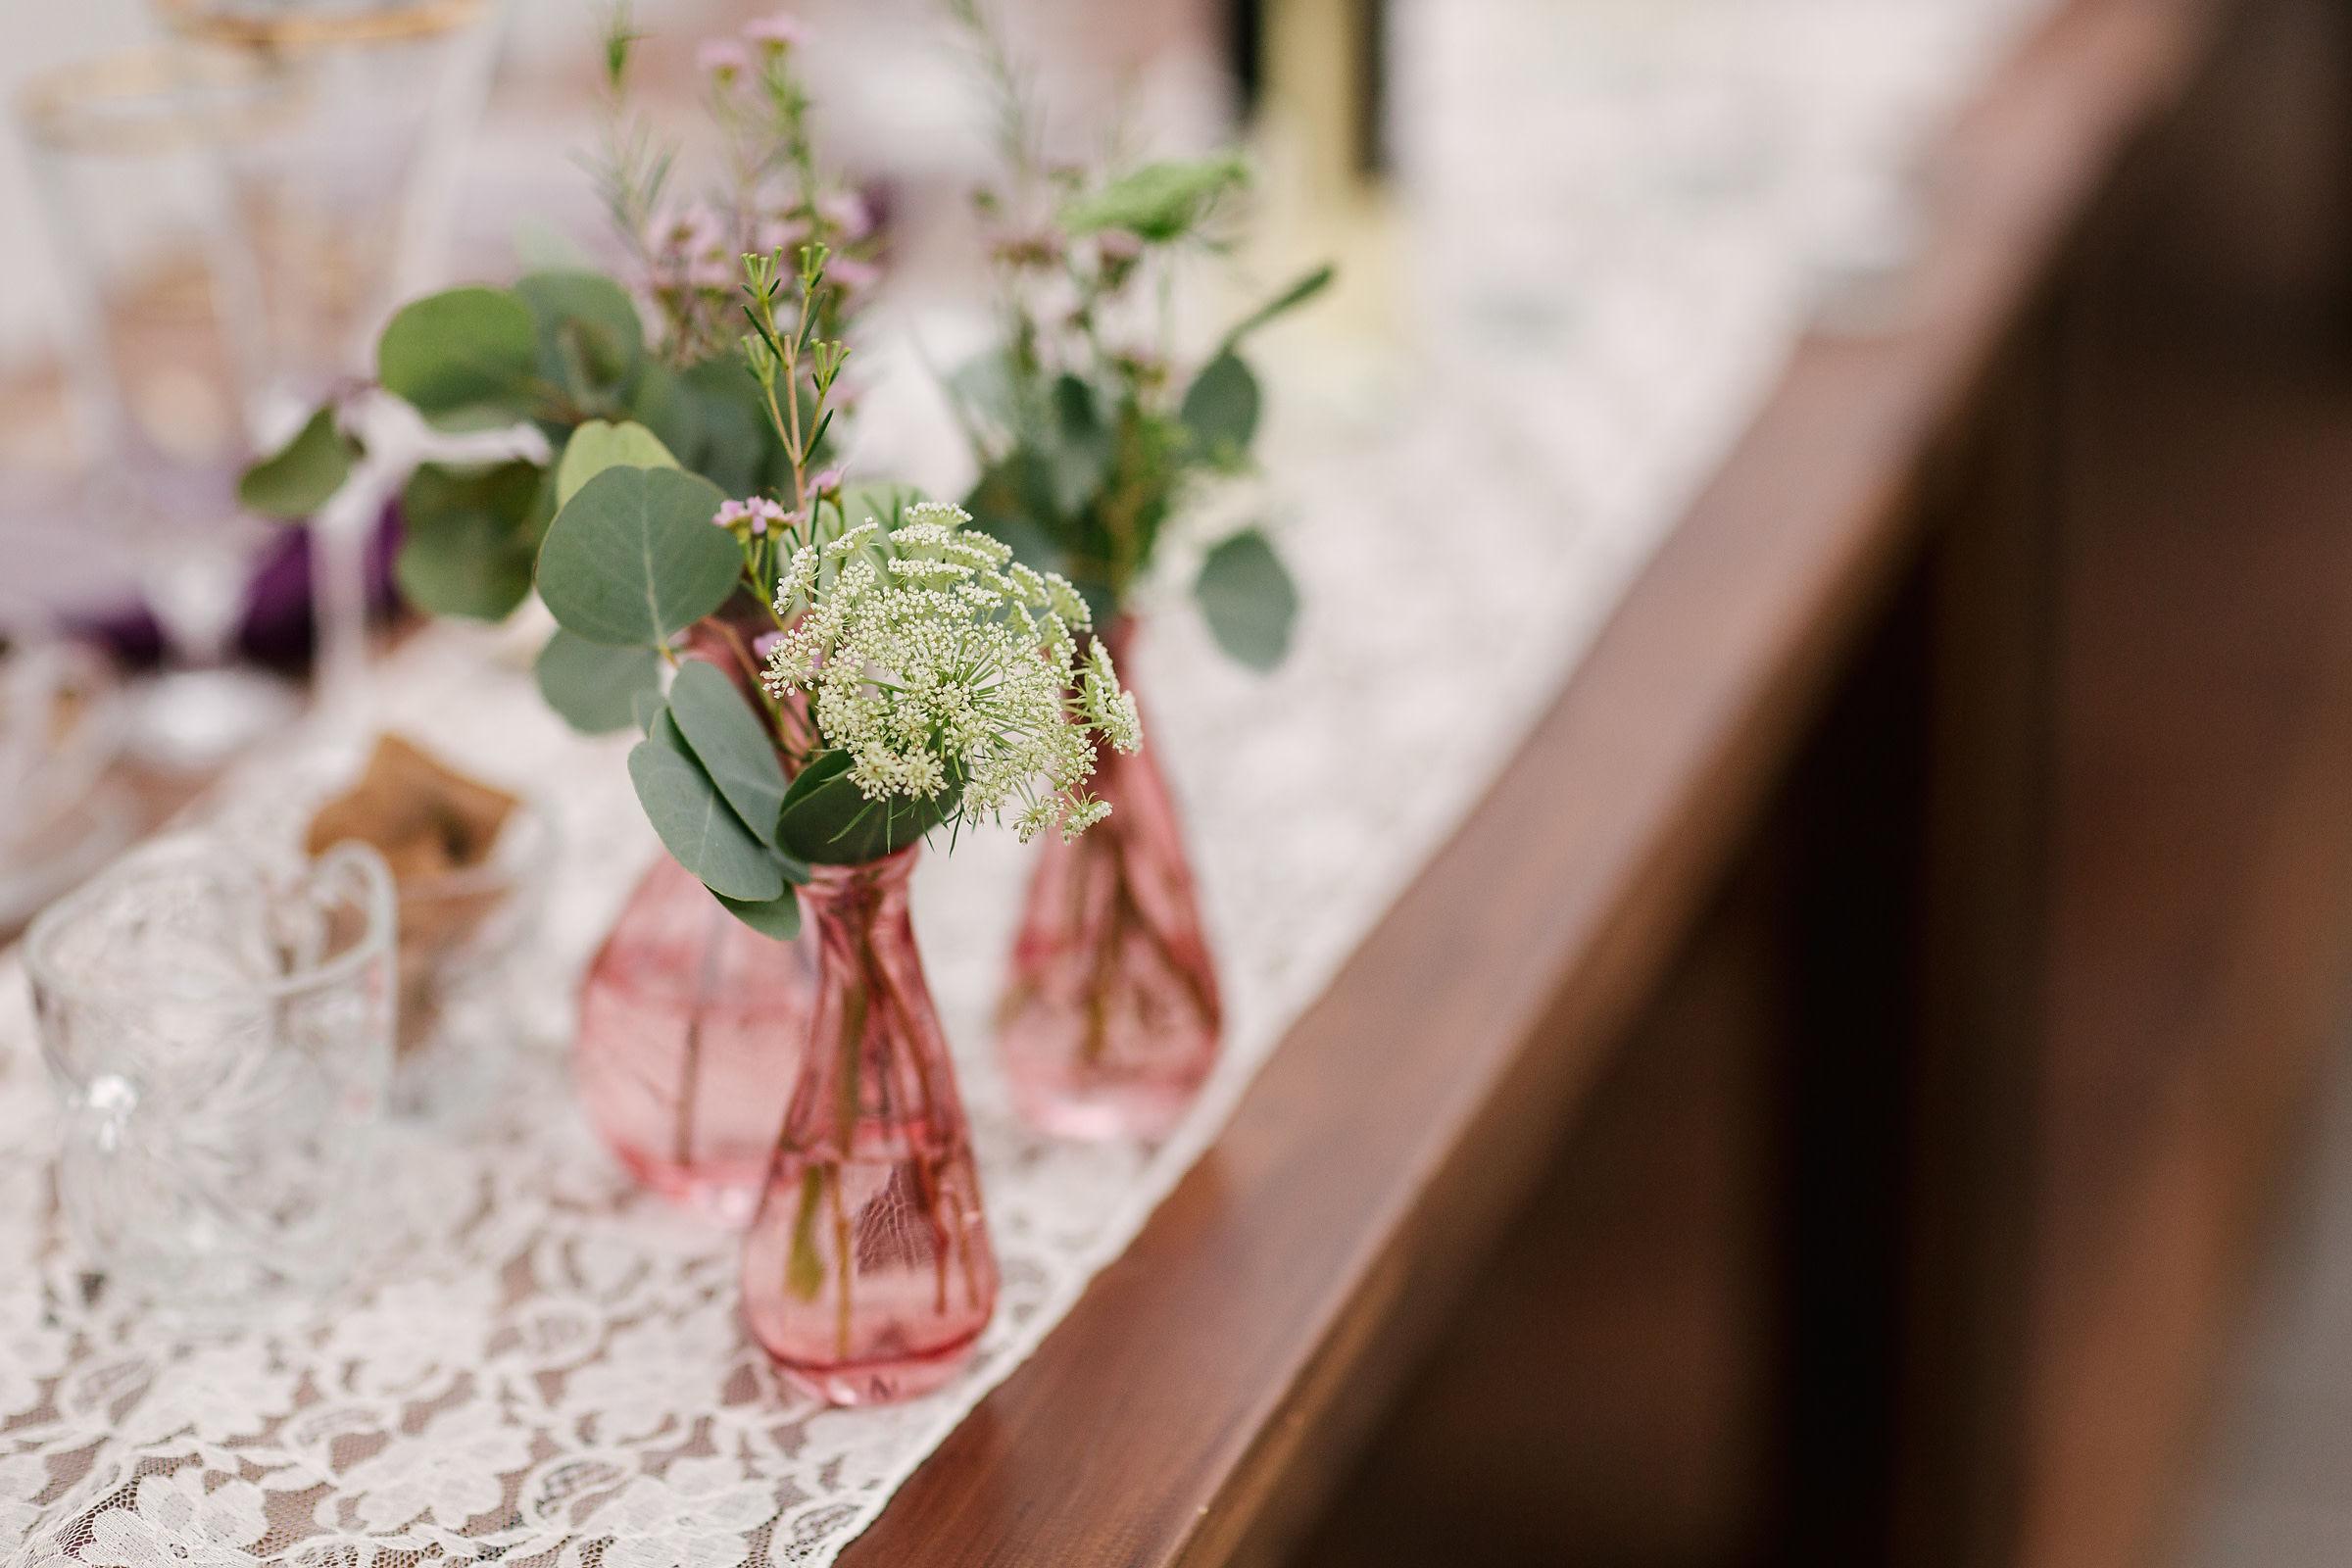 Stem Vase Wedding Decor - Inexpensive Wedding Flowers